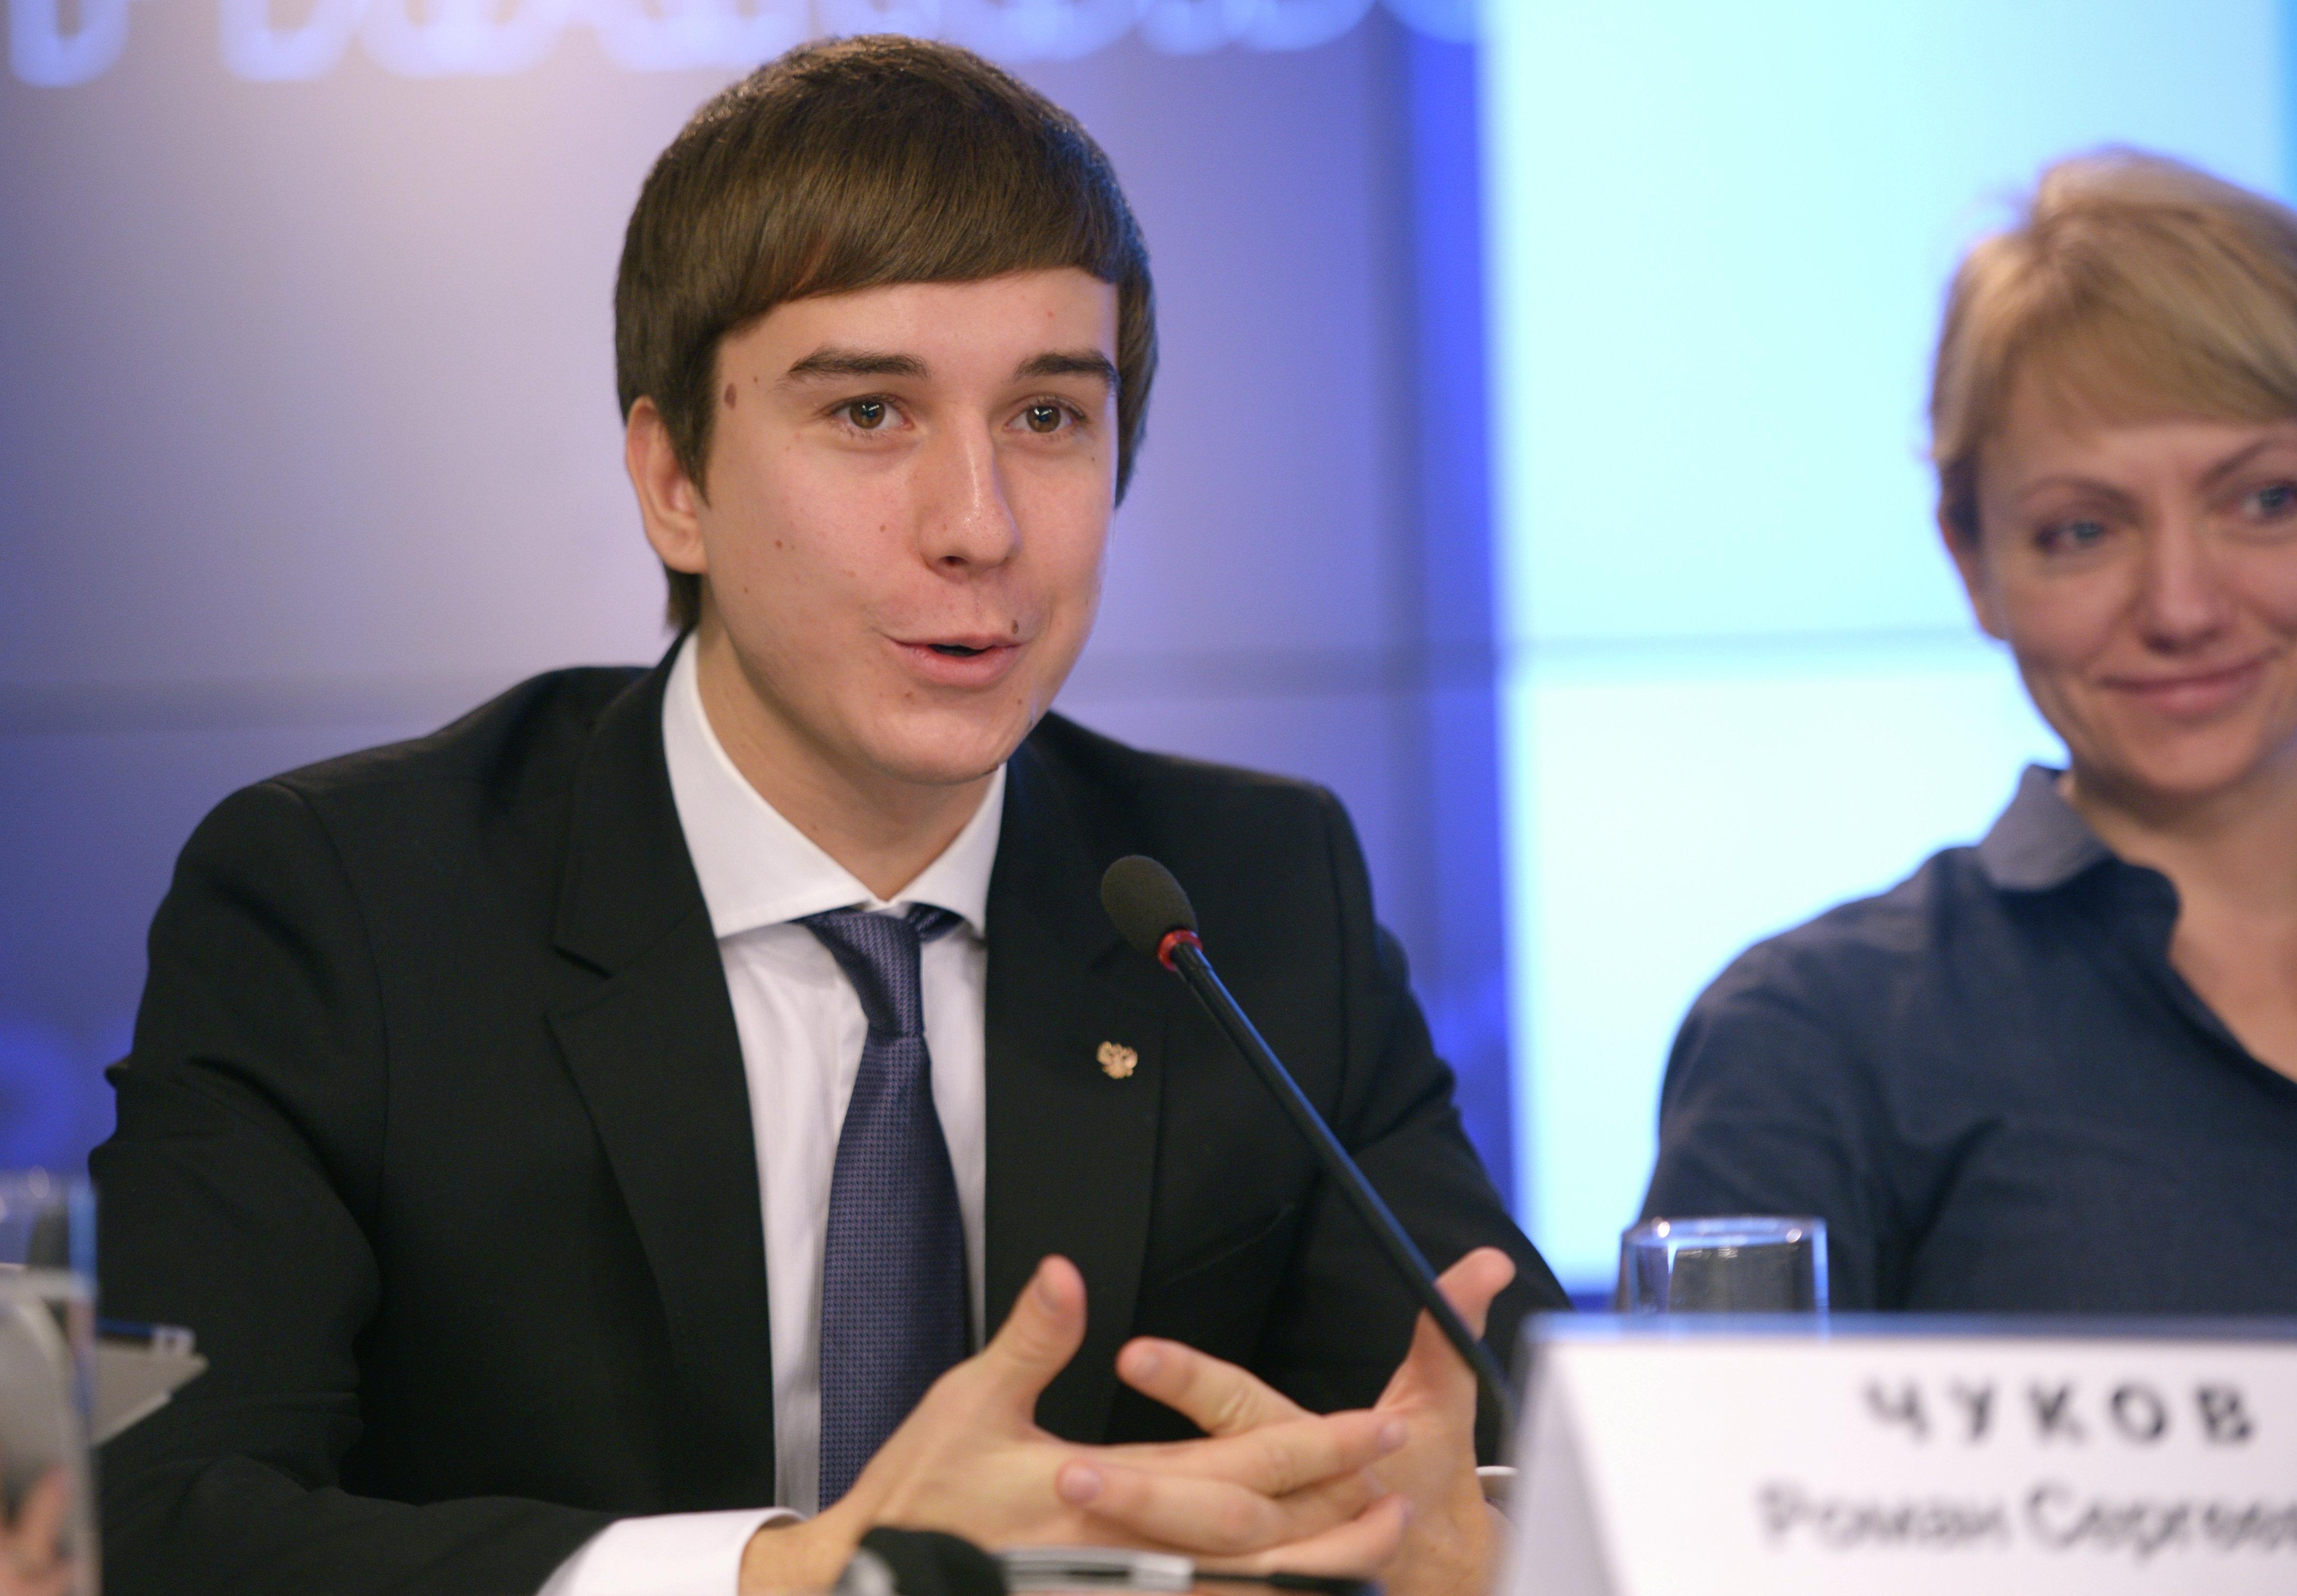 Roman Chukov - Davos' youngest participant.